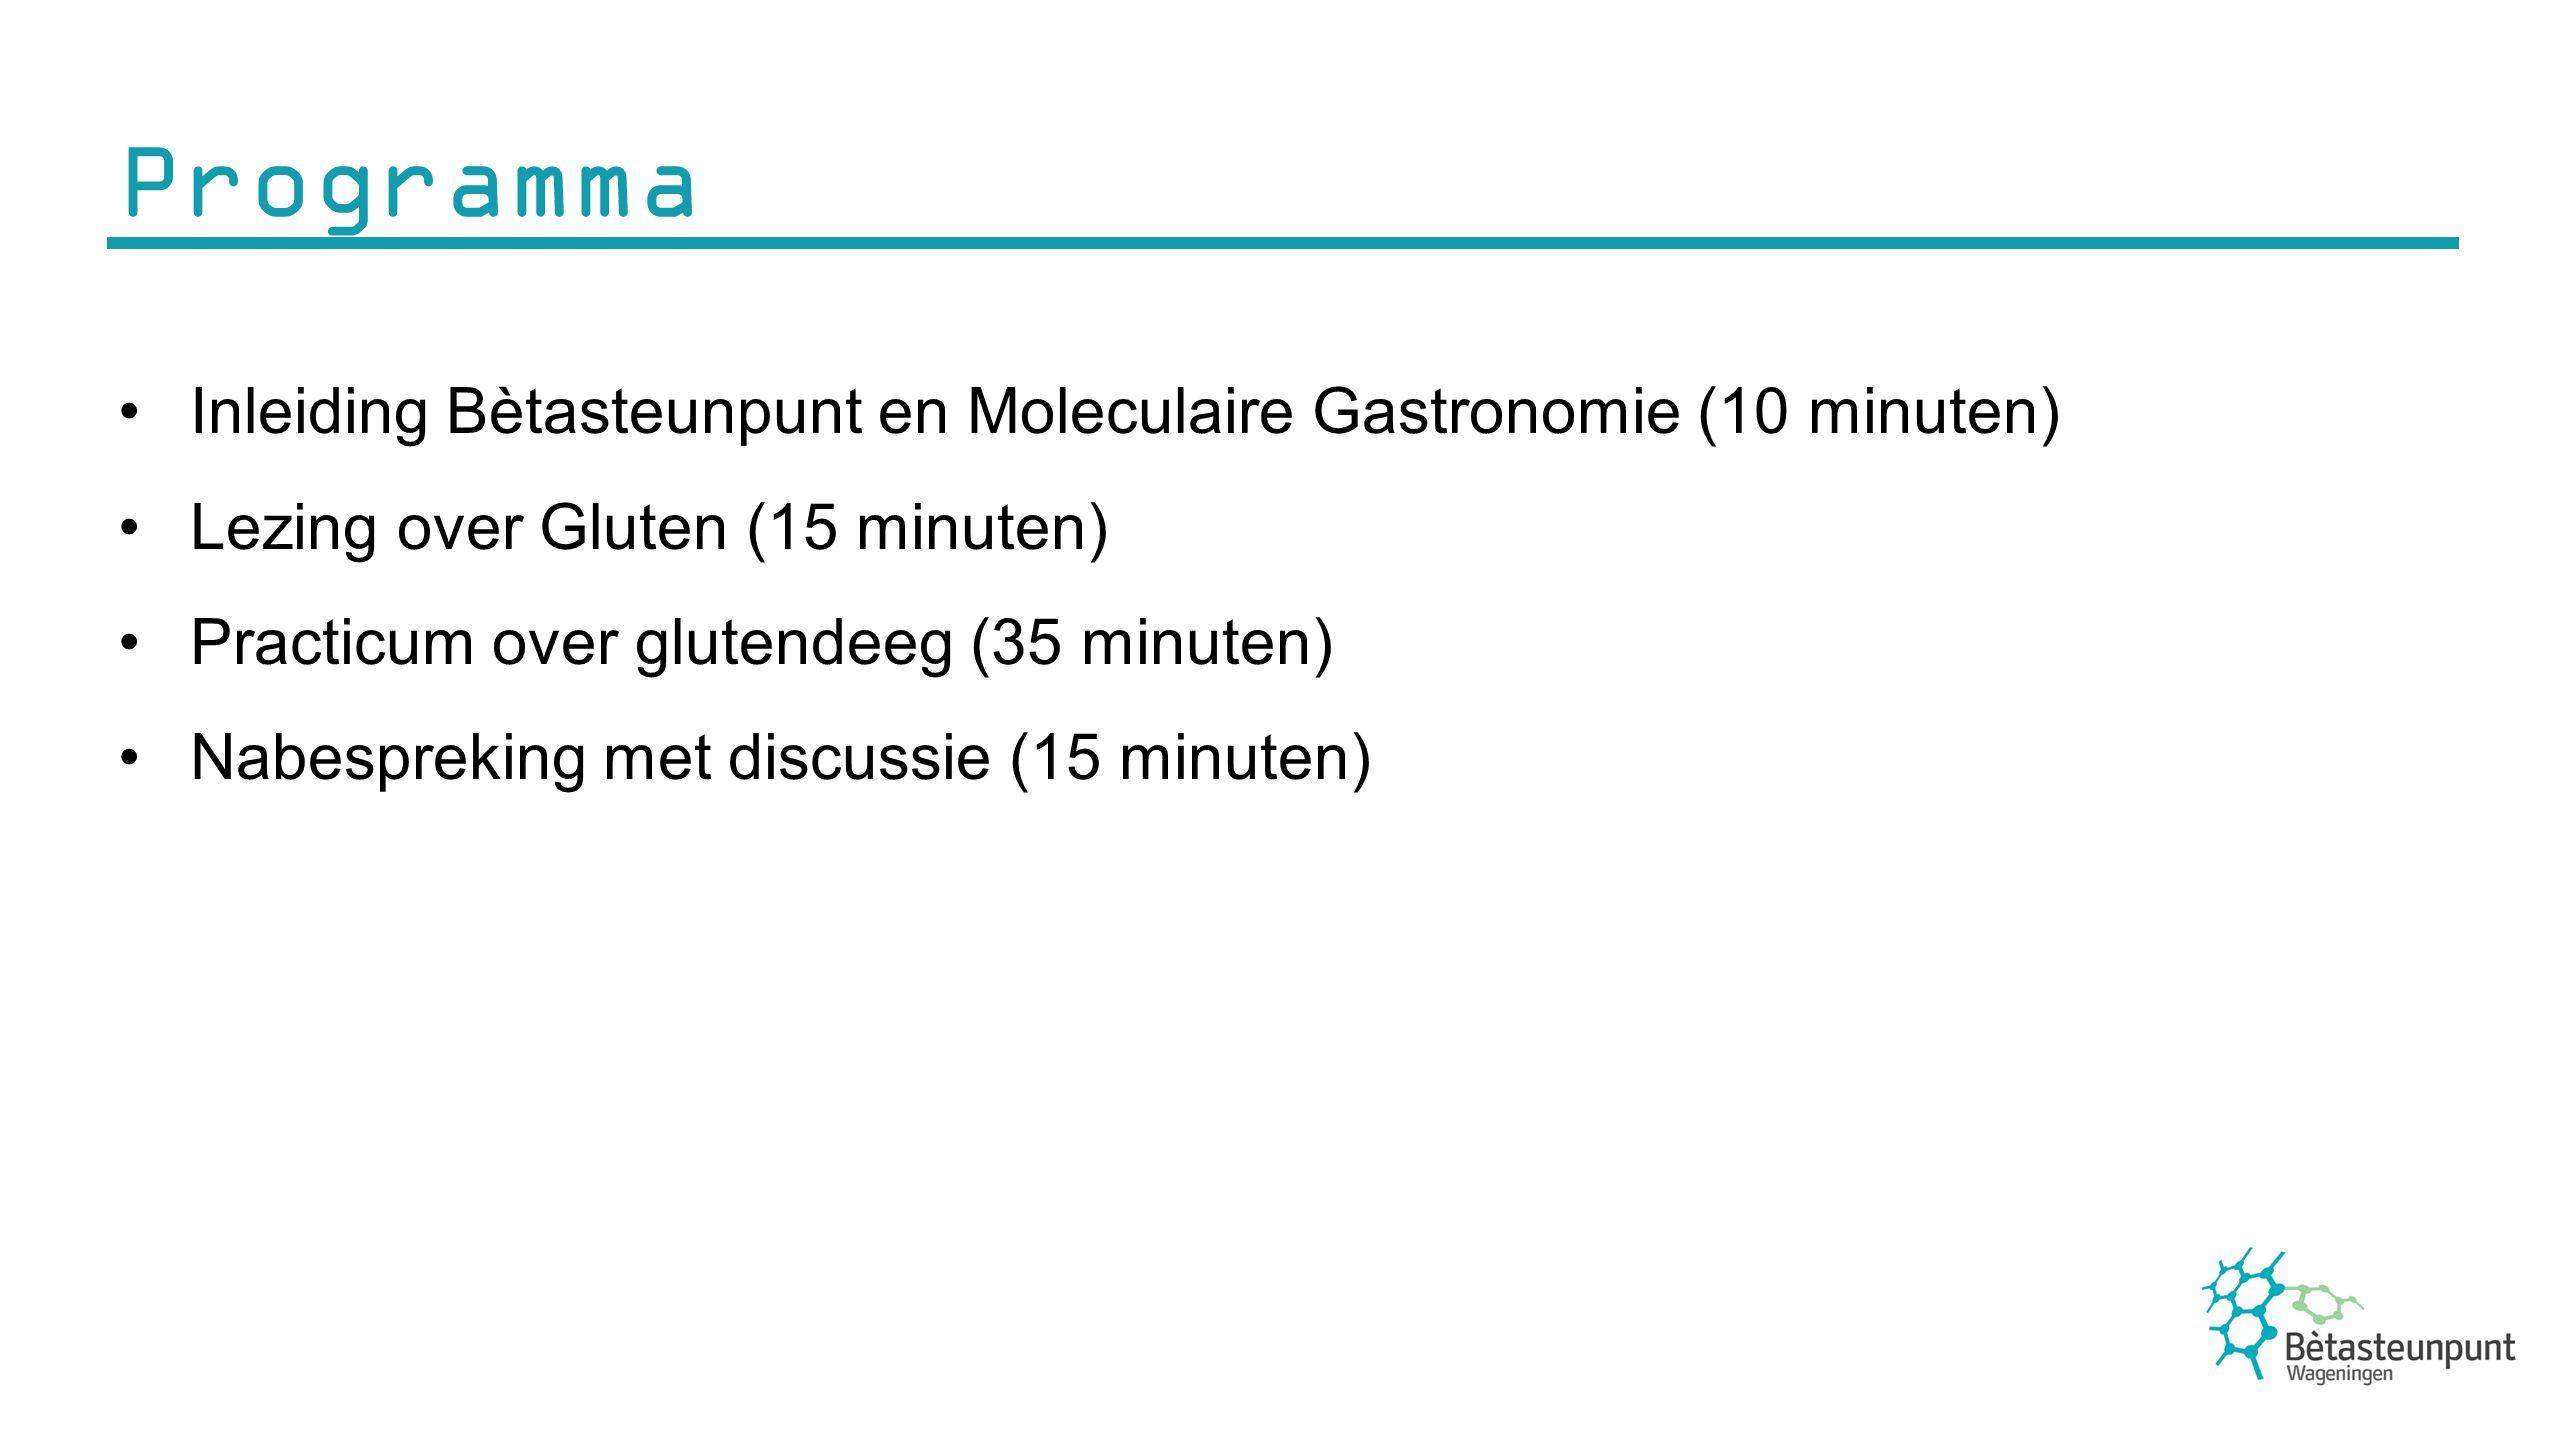 Programma Inleiding Bètasteunpunt en Moleculaire Gastronomie (10 minuten) Lezing over Gluten (15 minuten)